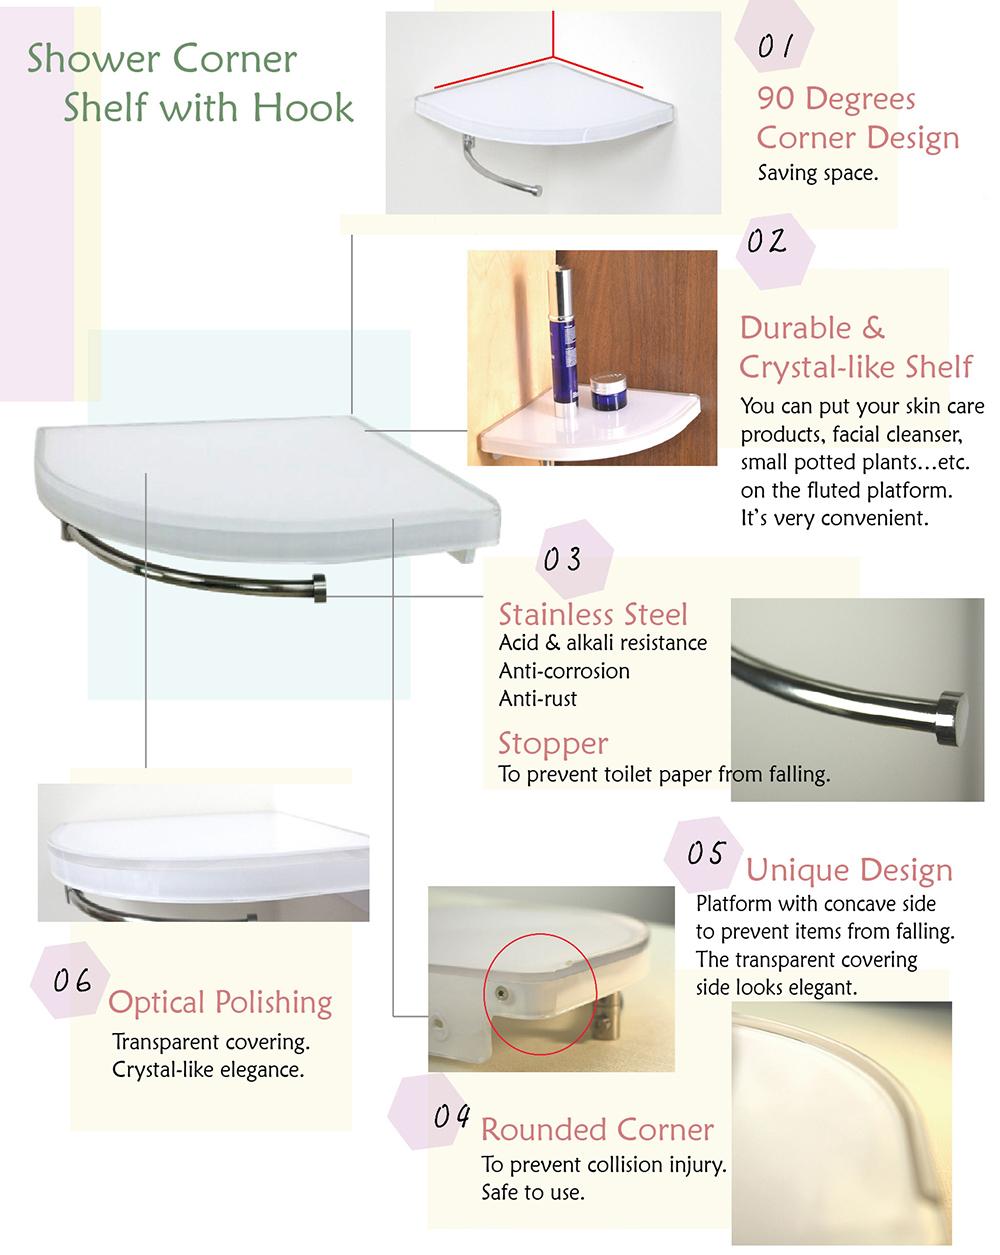 Ba10630 Shower Corner Shelf With Hook